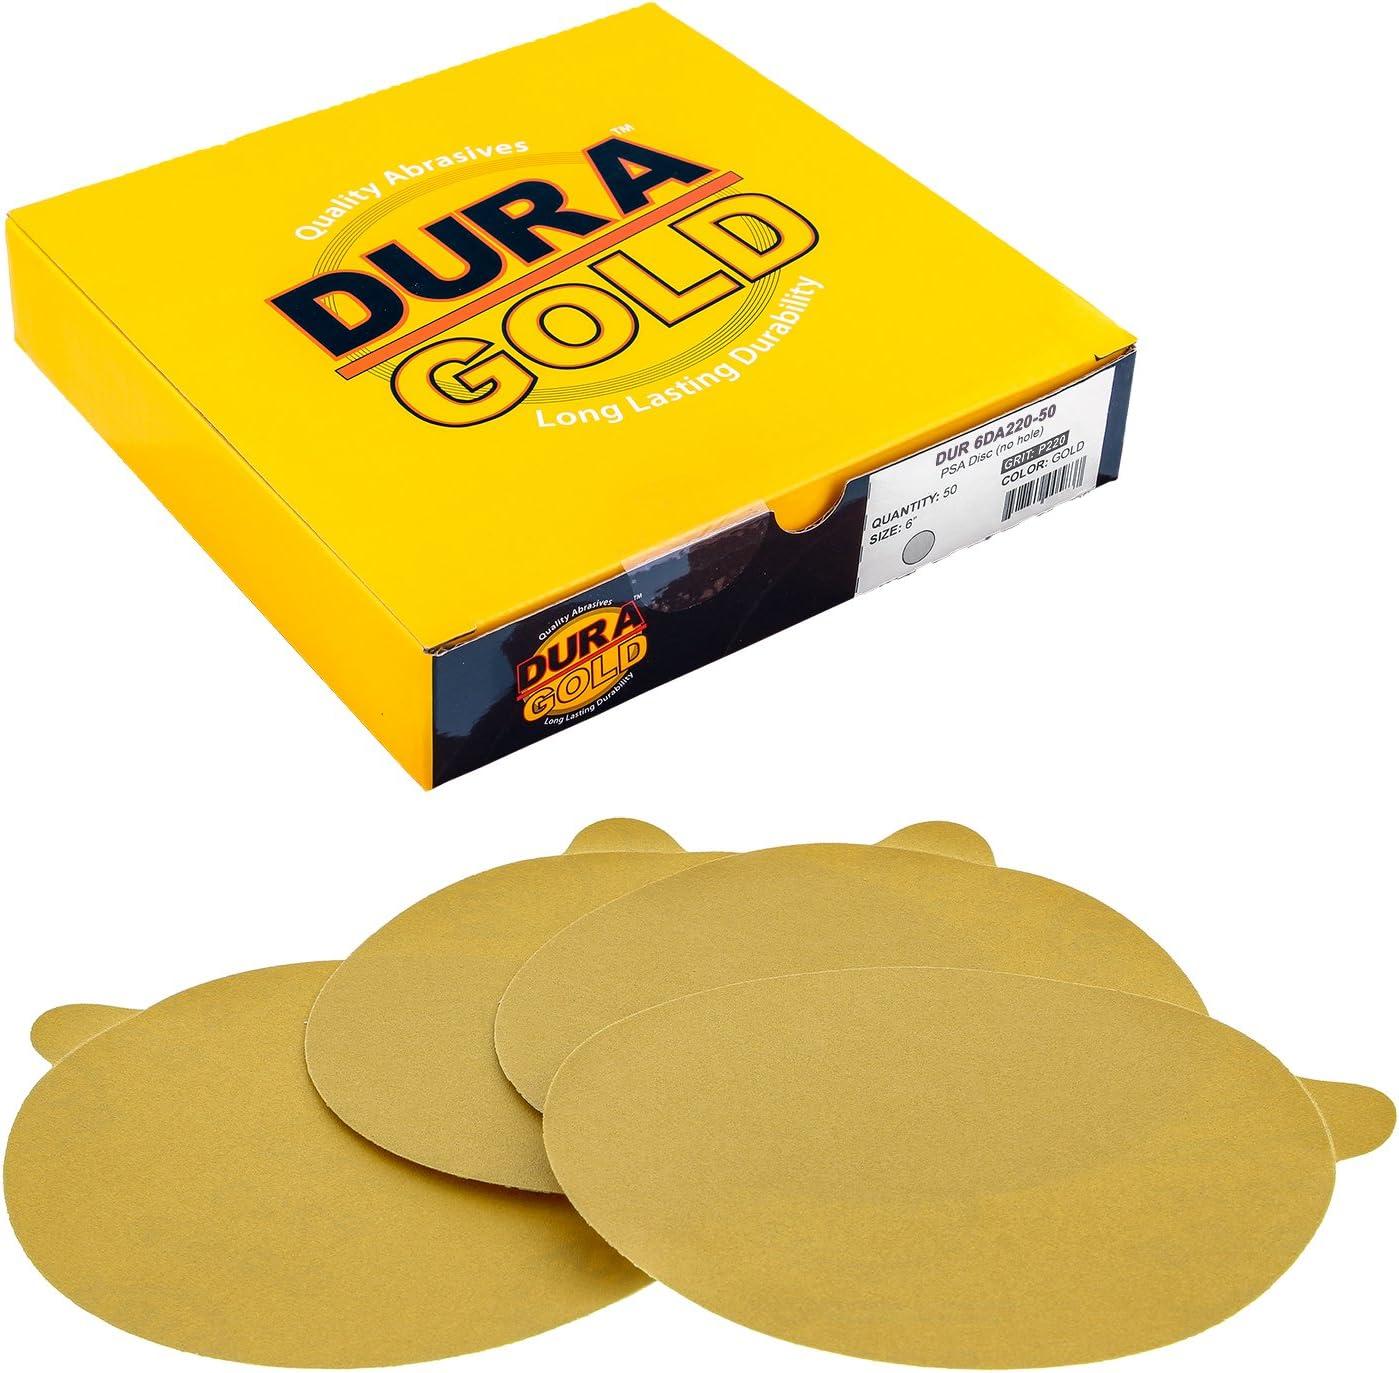 "Sand Paper PSA 6/"" DA 500 Grit Stick-on 25 Pcs"